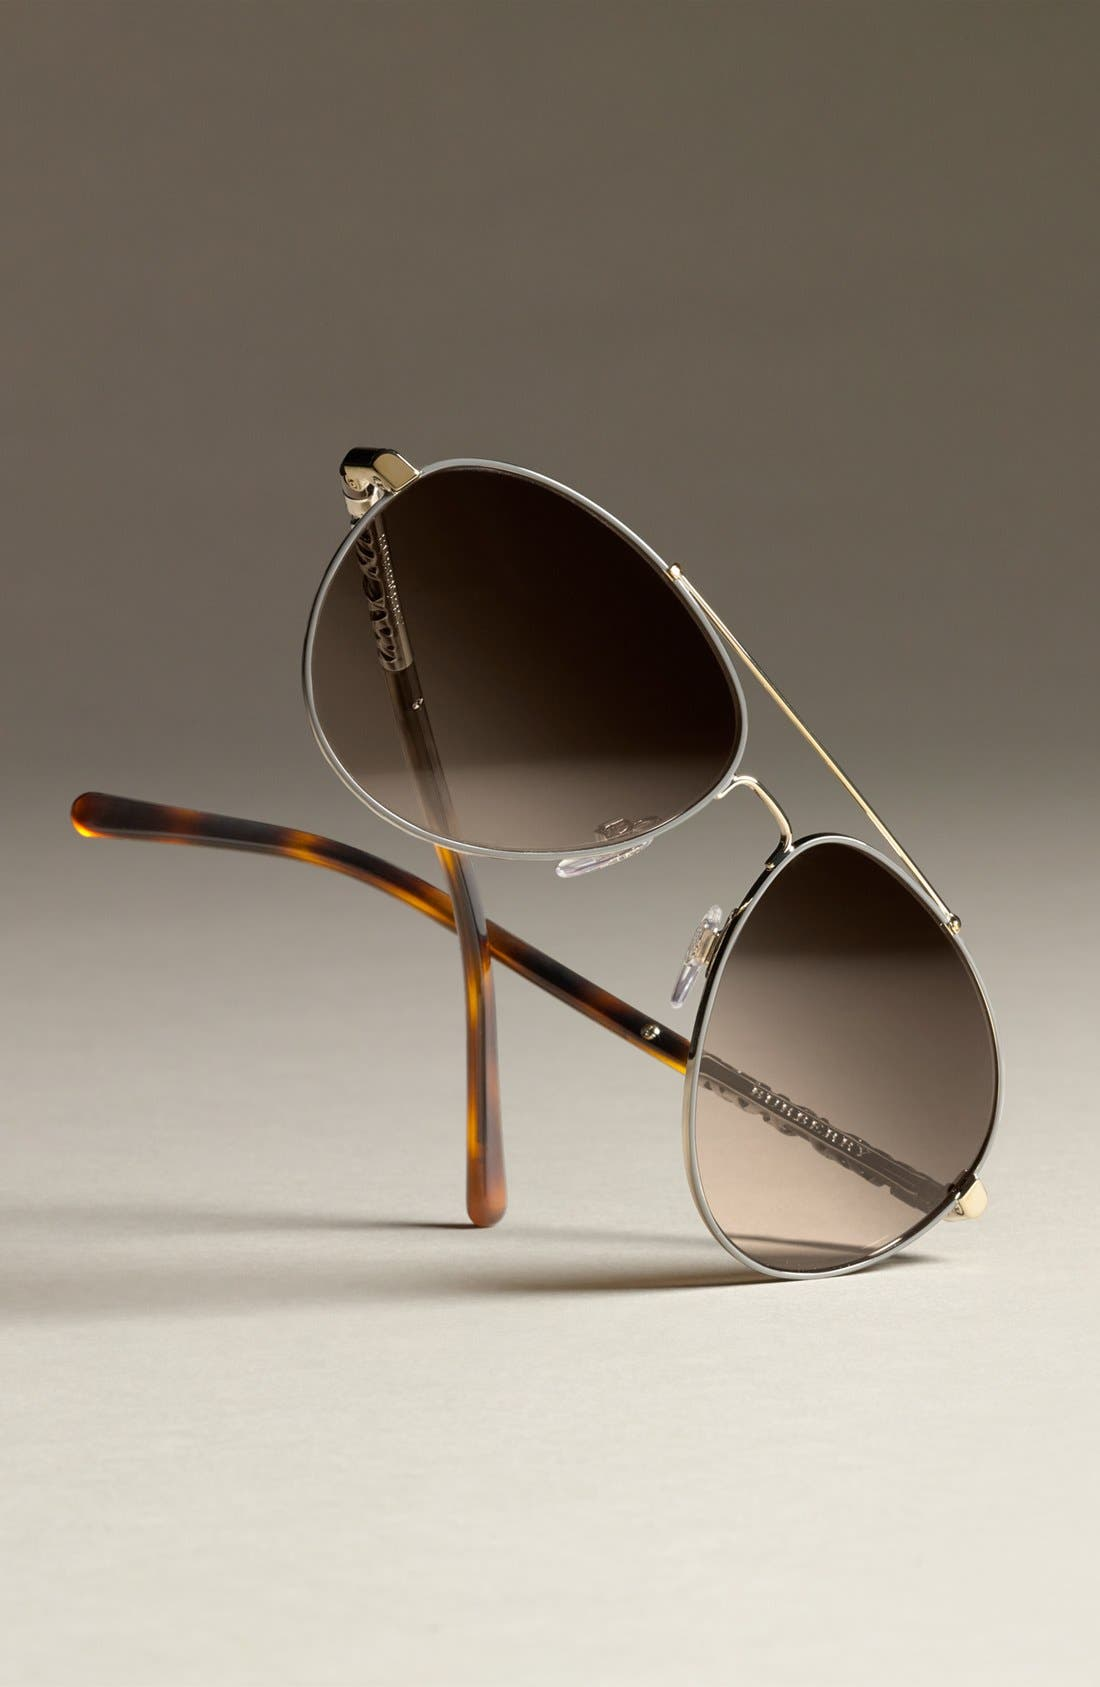 58mm Aviator Sunglasses,                             Alternate thumbnail 3, color,                             020